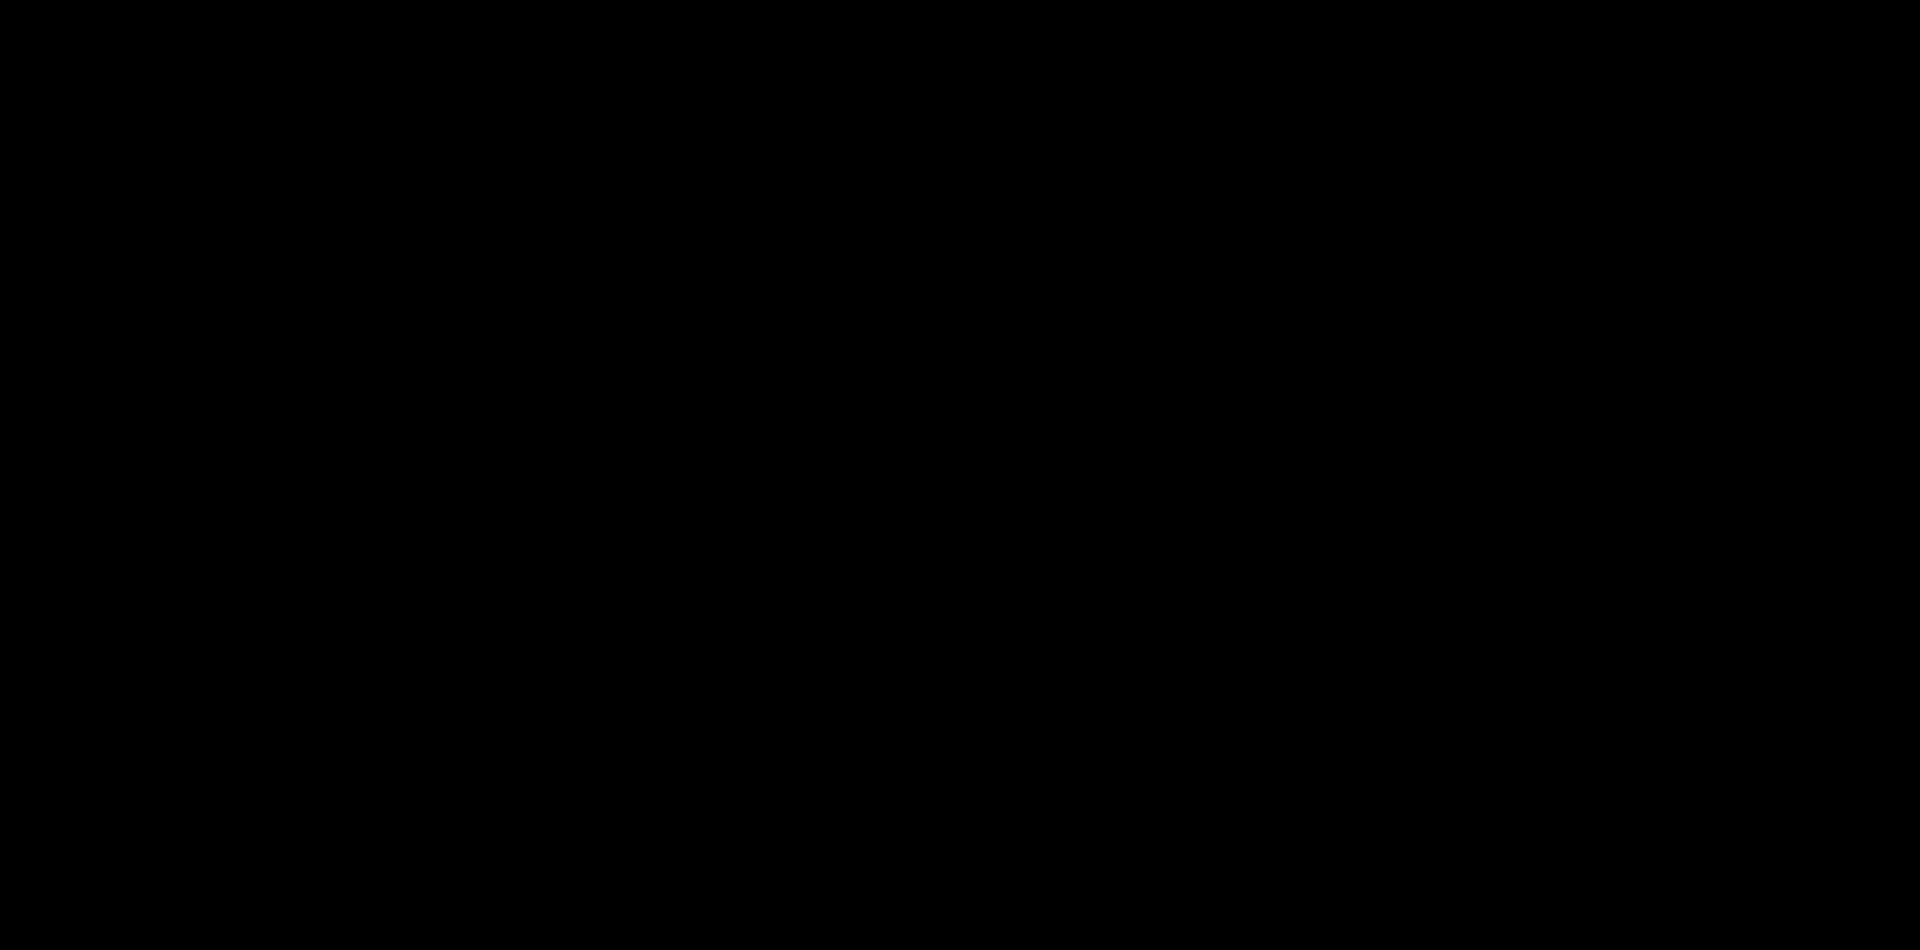 Hamburgerei Corona